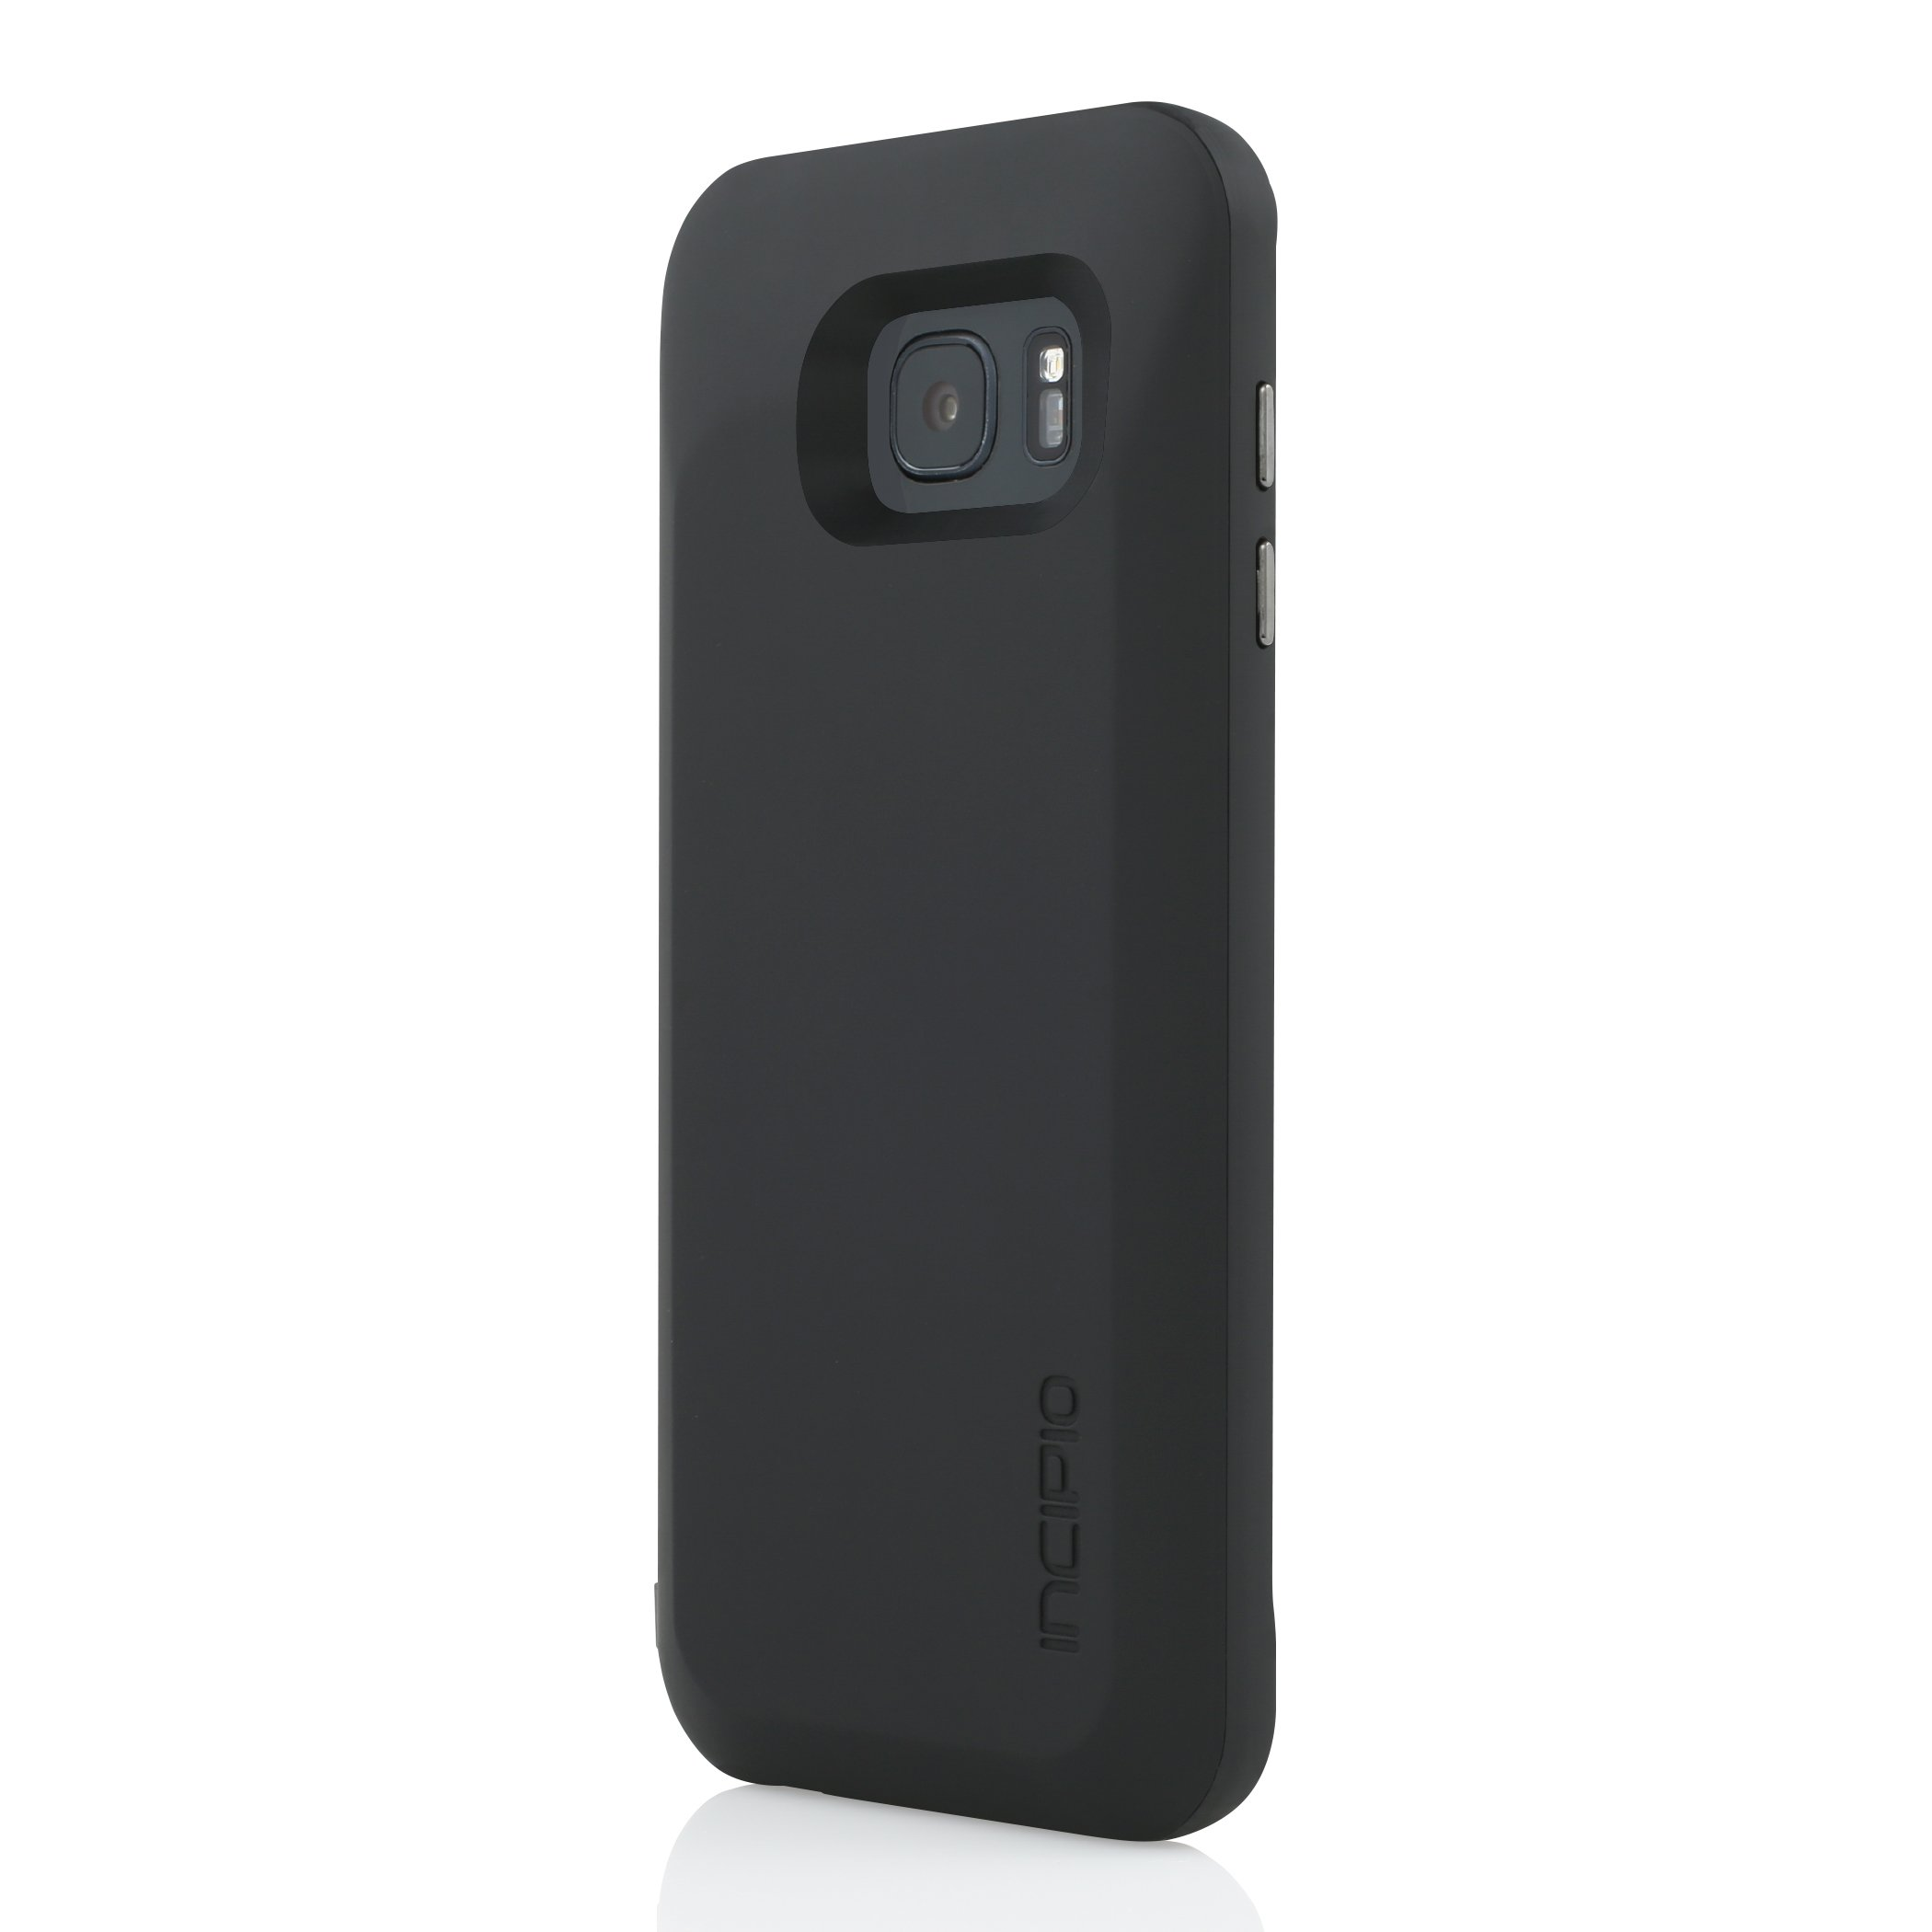 Incipio offGRID batería Case para Samsung Galaxy S7 Edge en negro - de Samsung Certificado Carcasa [batería